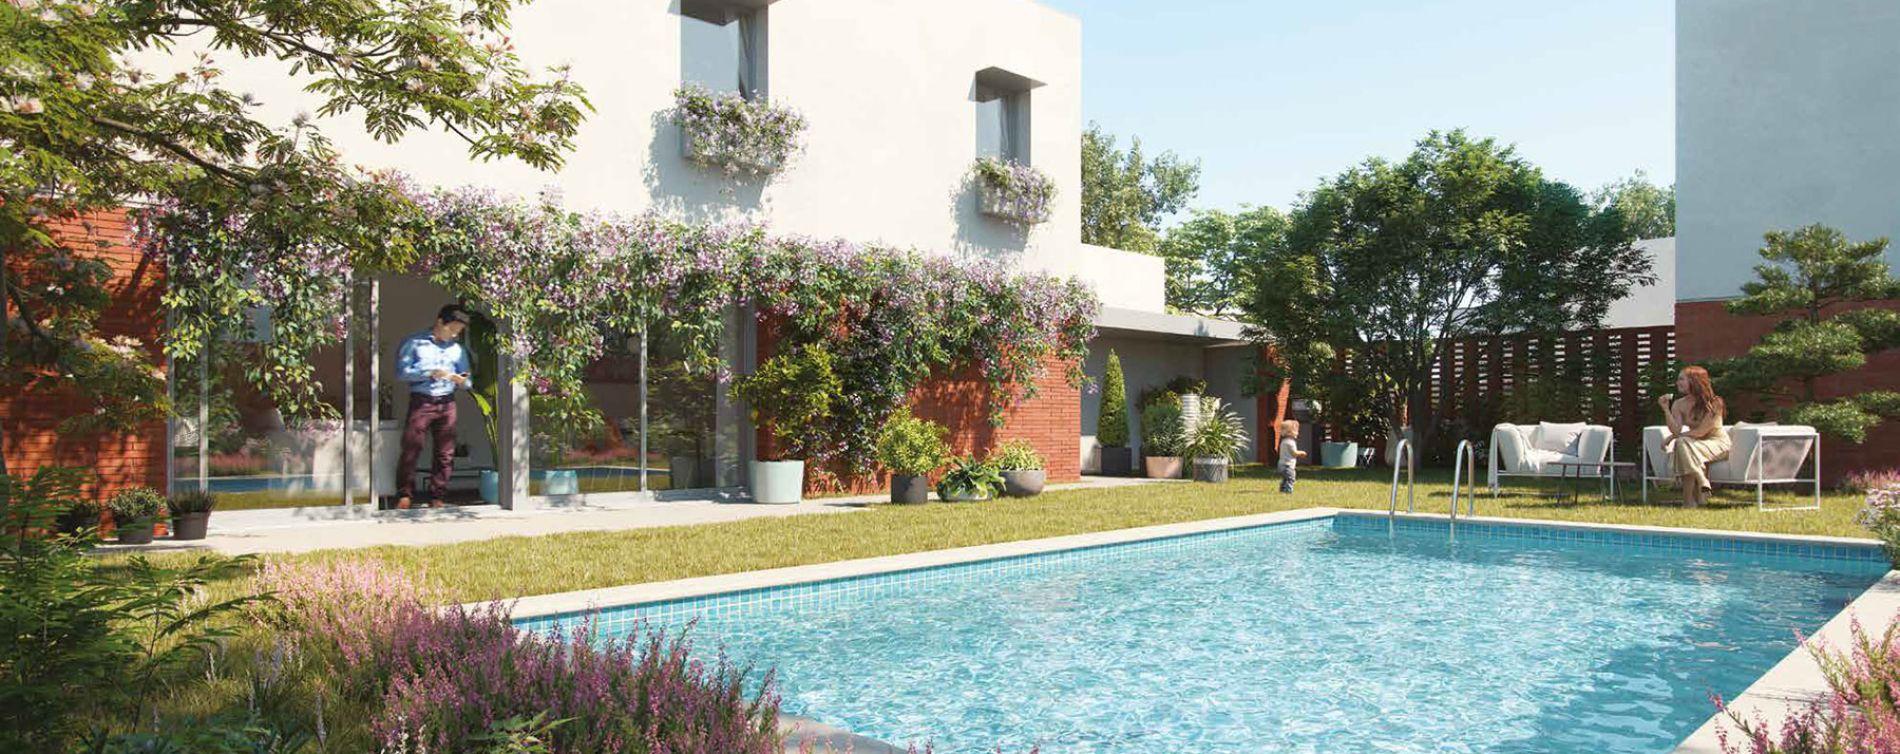 Beauzelle : programme immobilier neuve « Poppy »